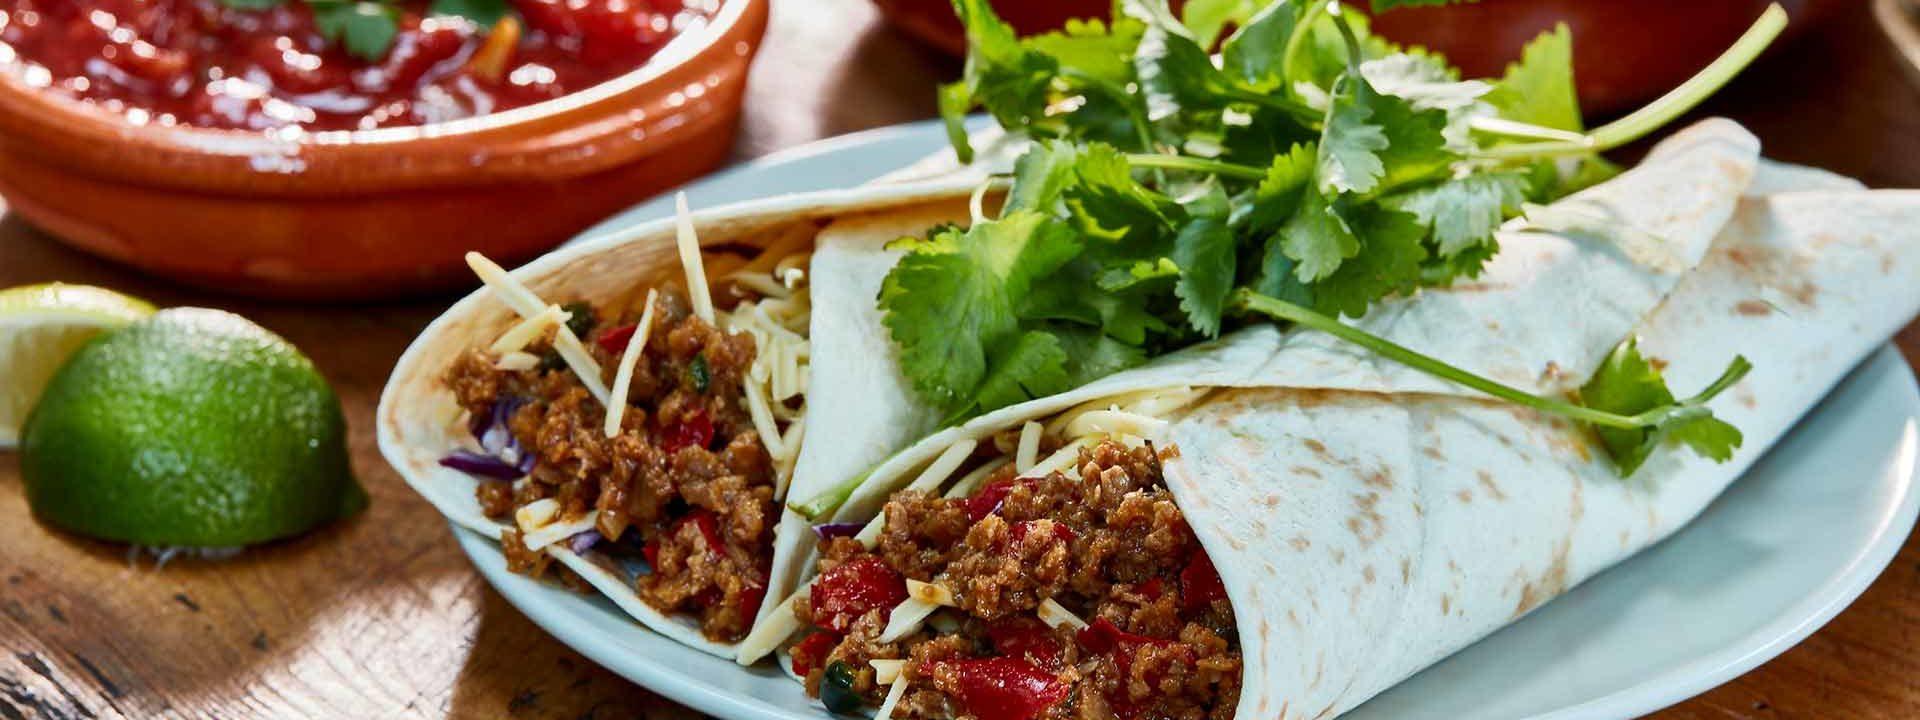 Simpleas vegan taco wraps